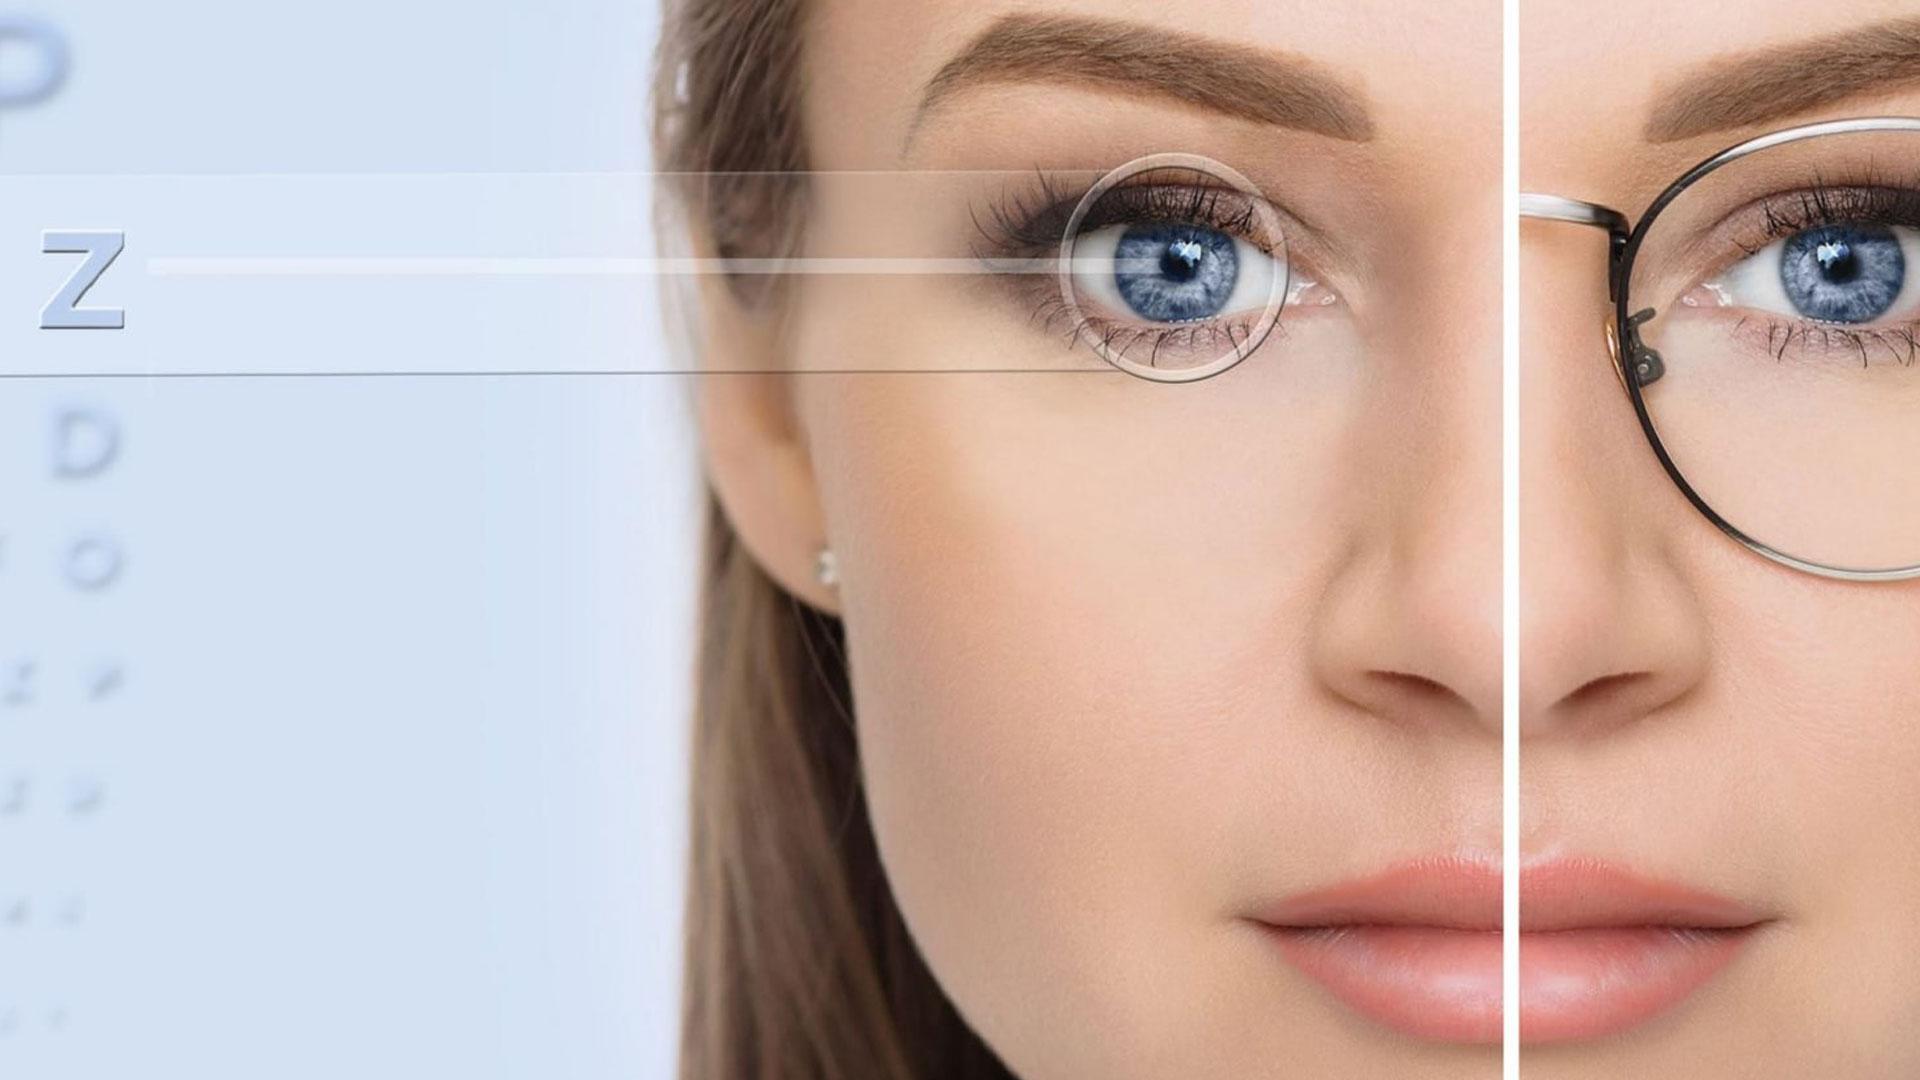 1 5 vederea se poate deteriora miopie mixtă